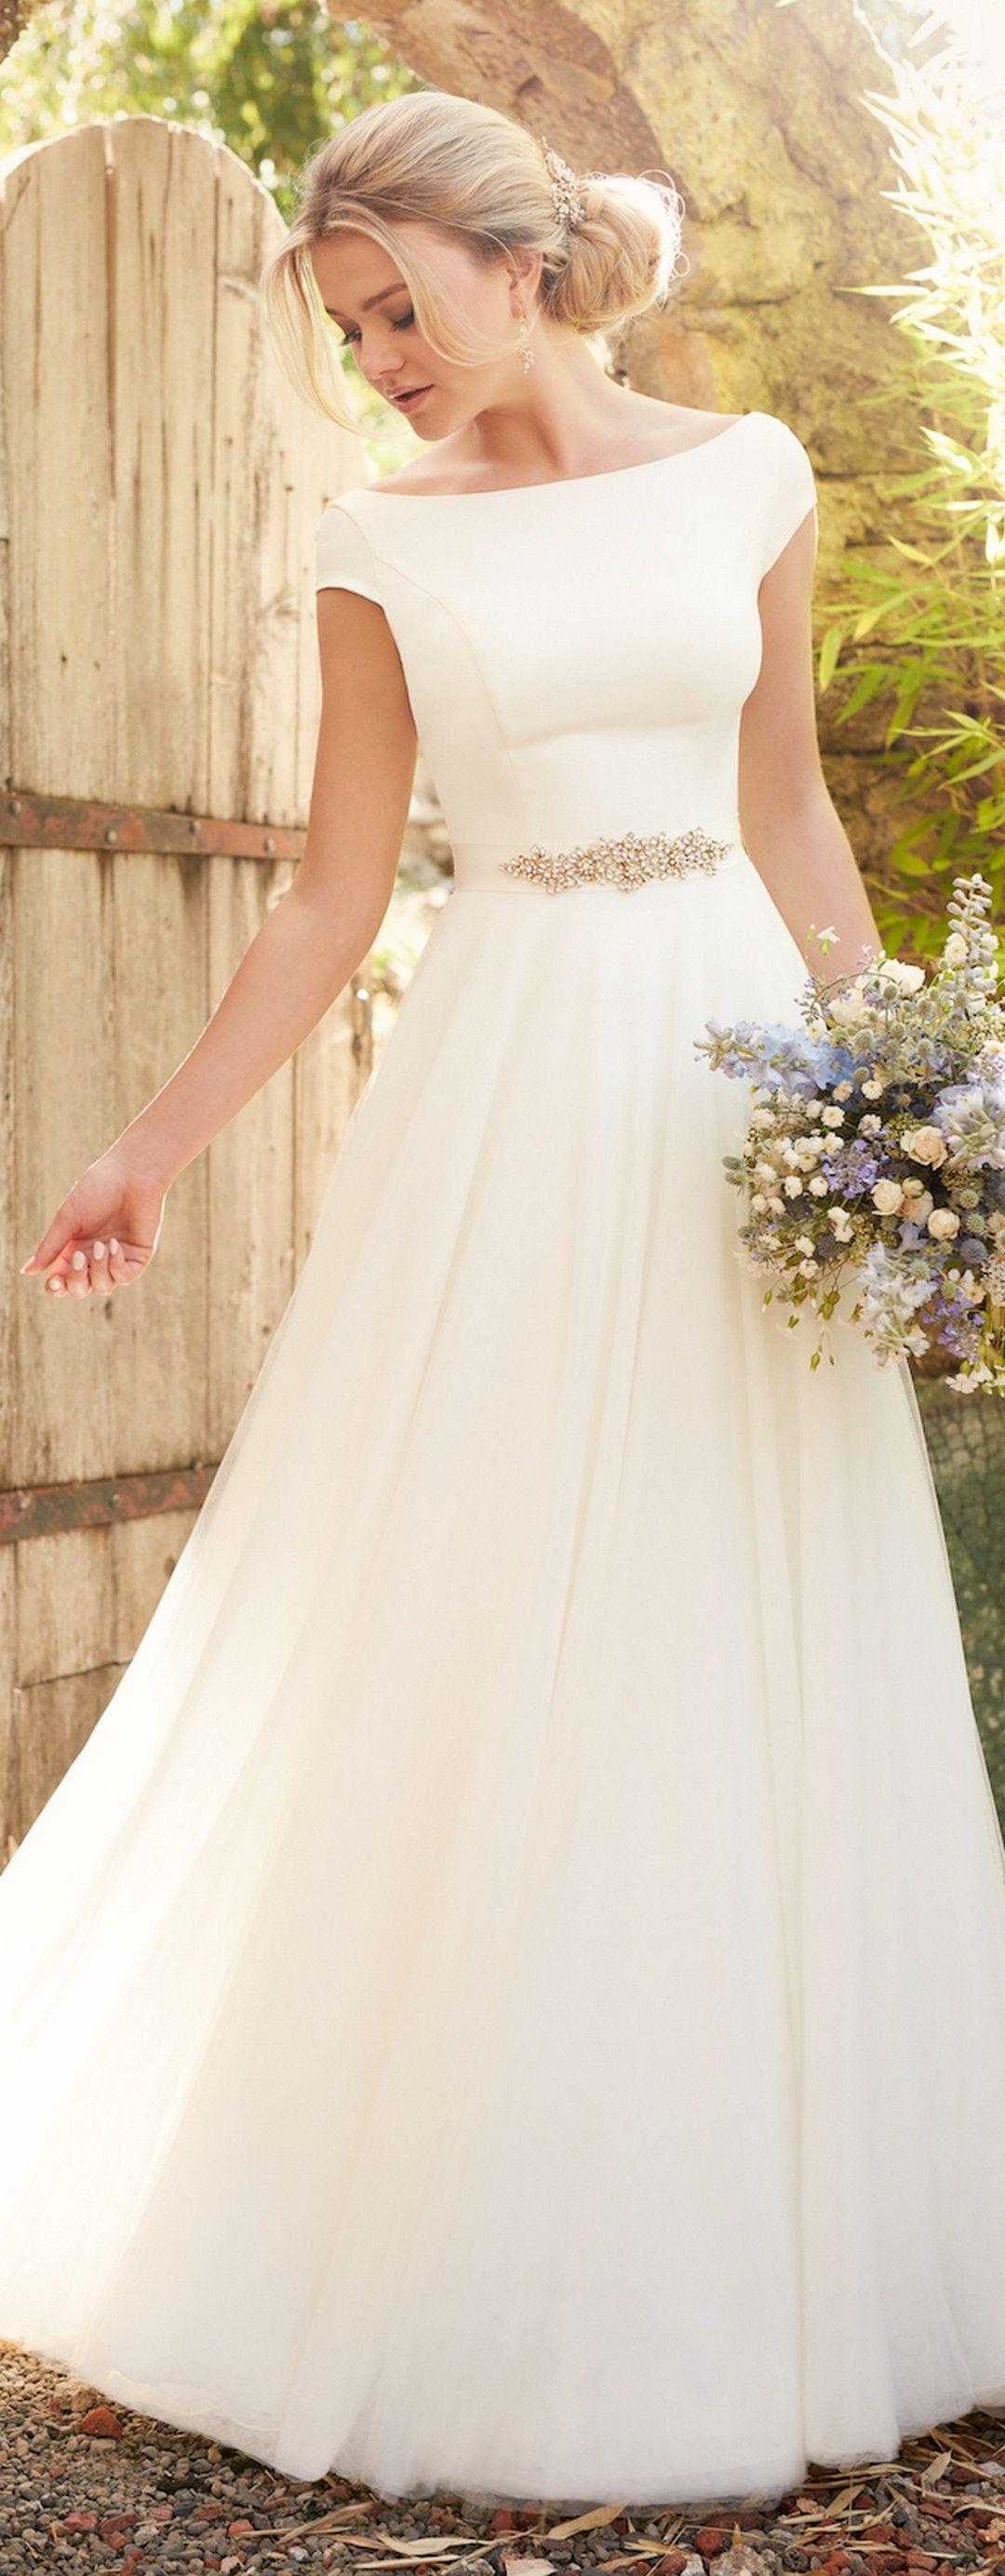 beautiful dreamy wedding dresses design you should consider